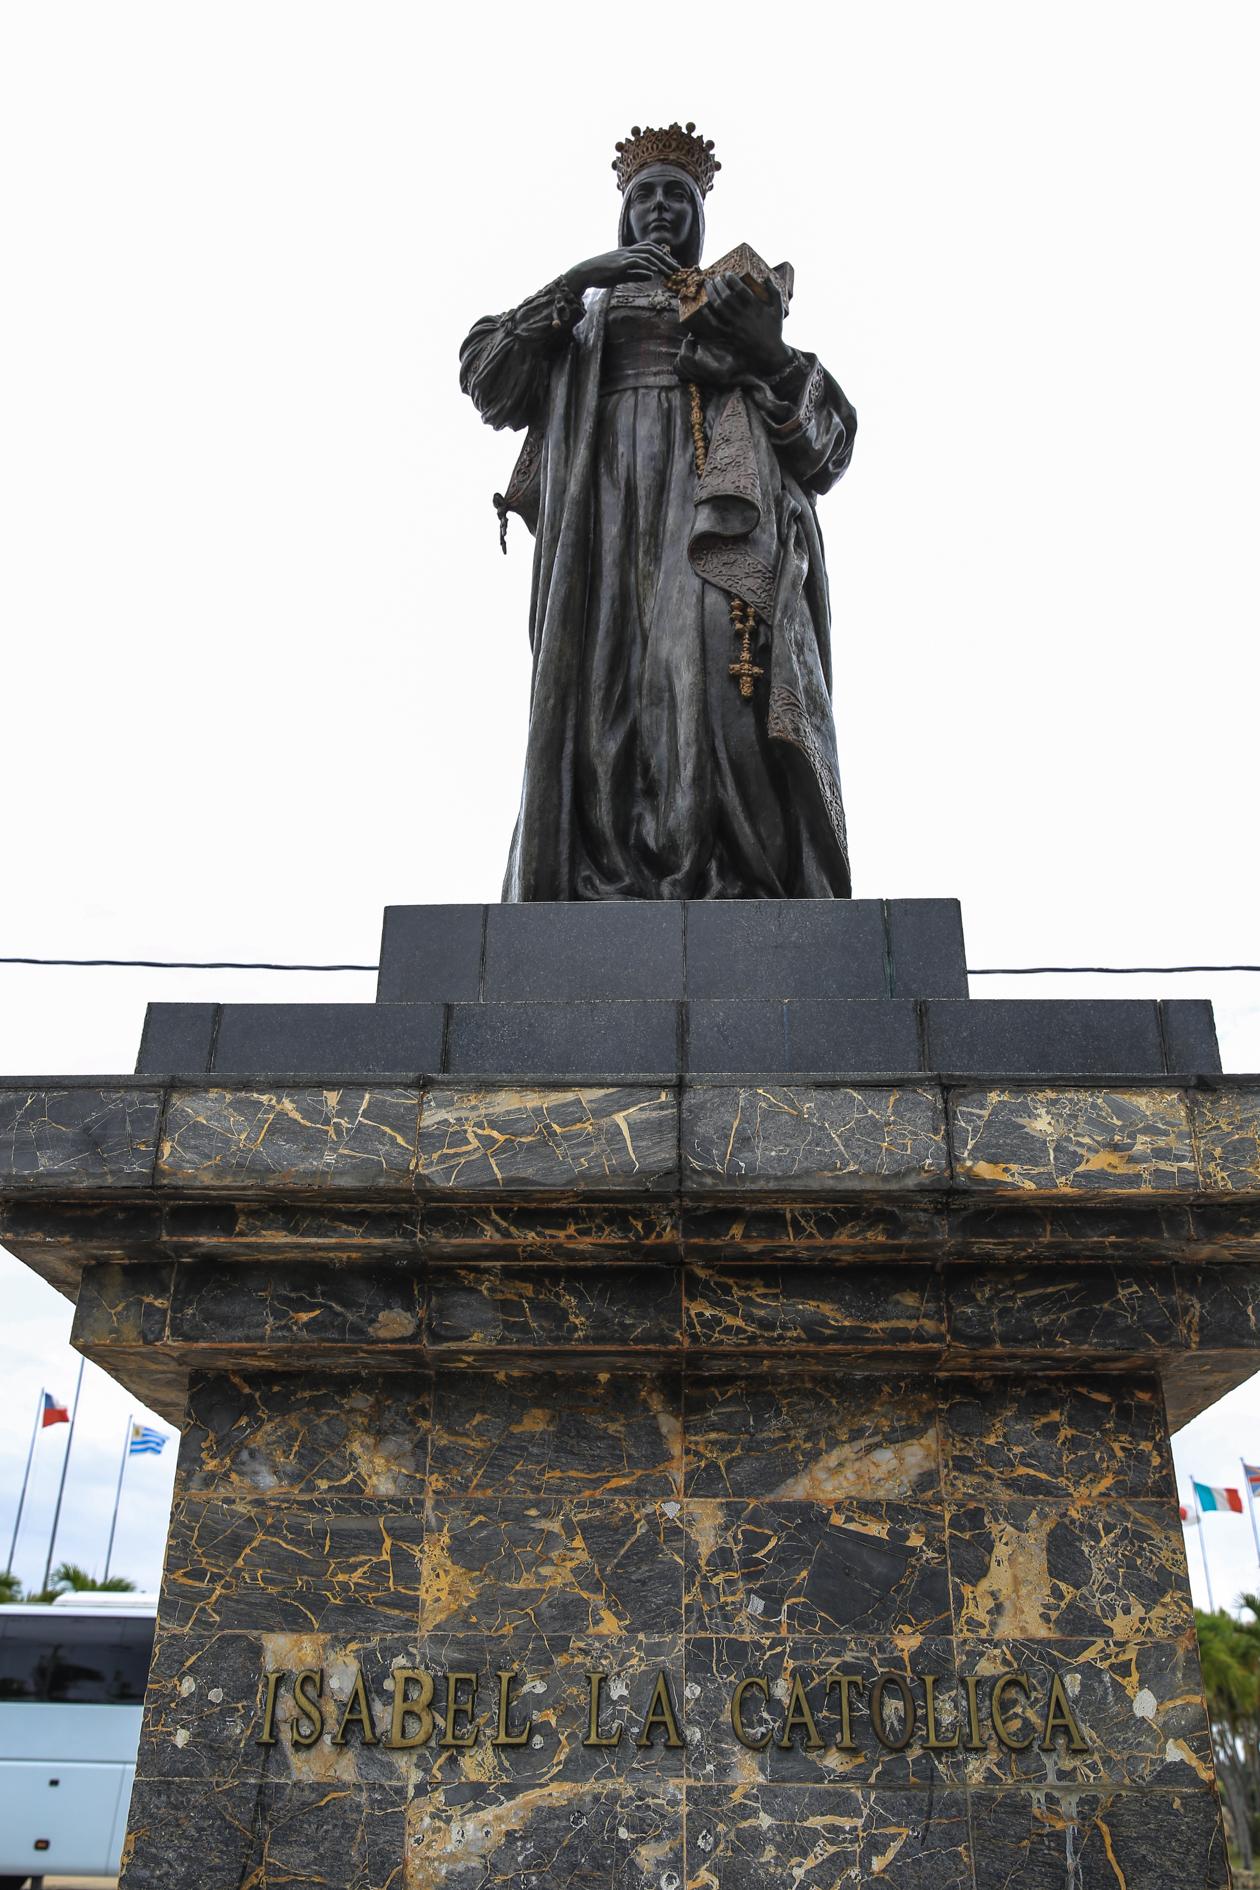 santodomingo-standbeedl-isabel-la-catolica